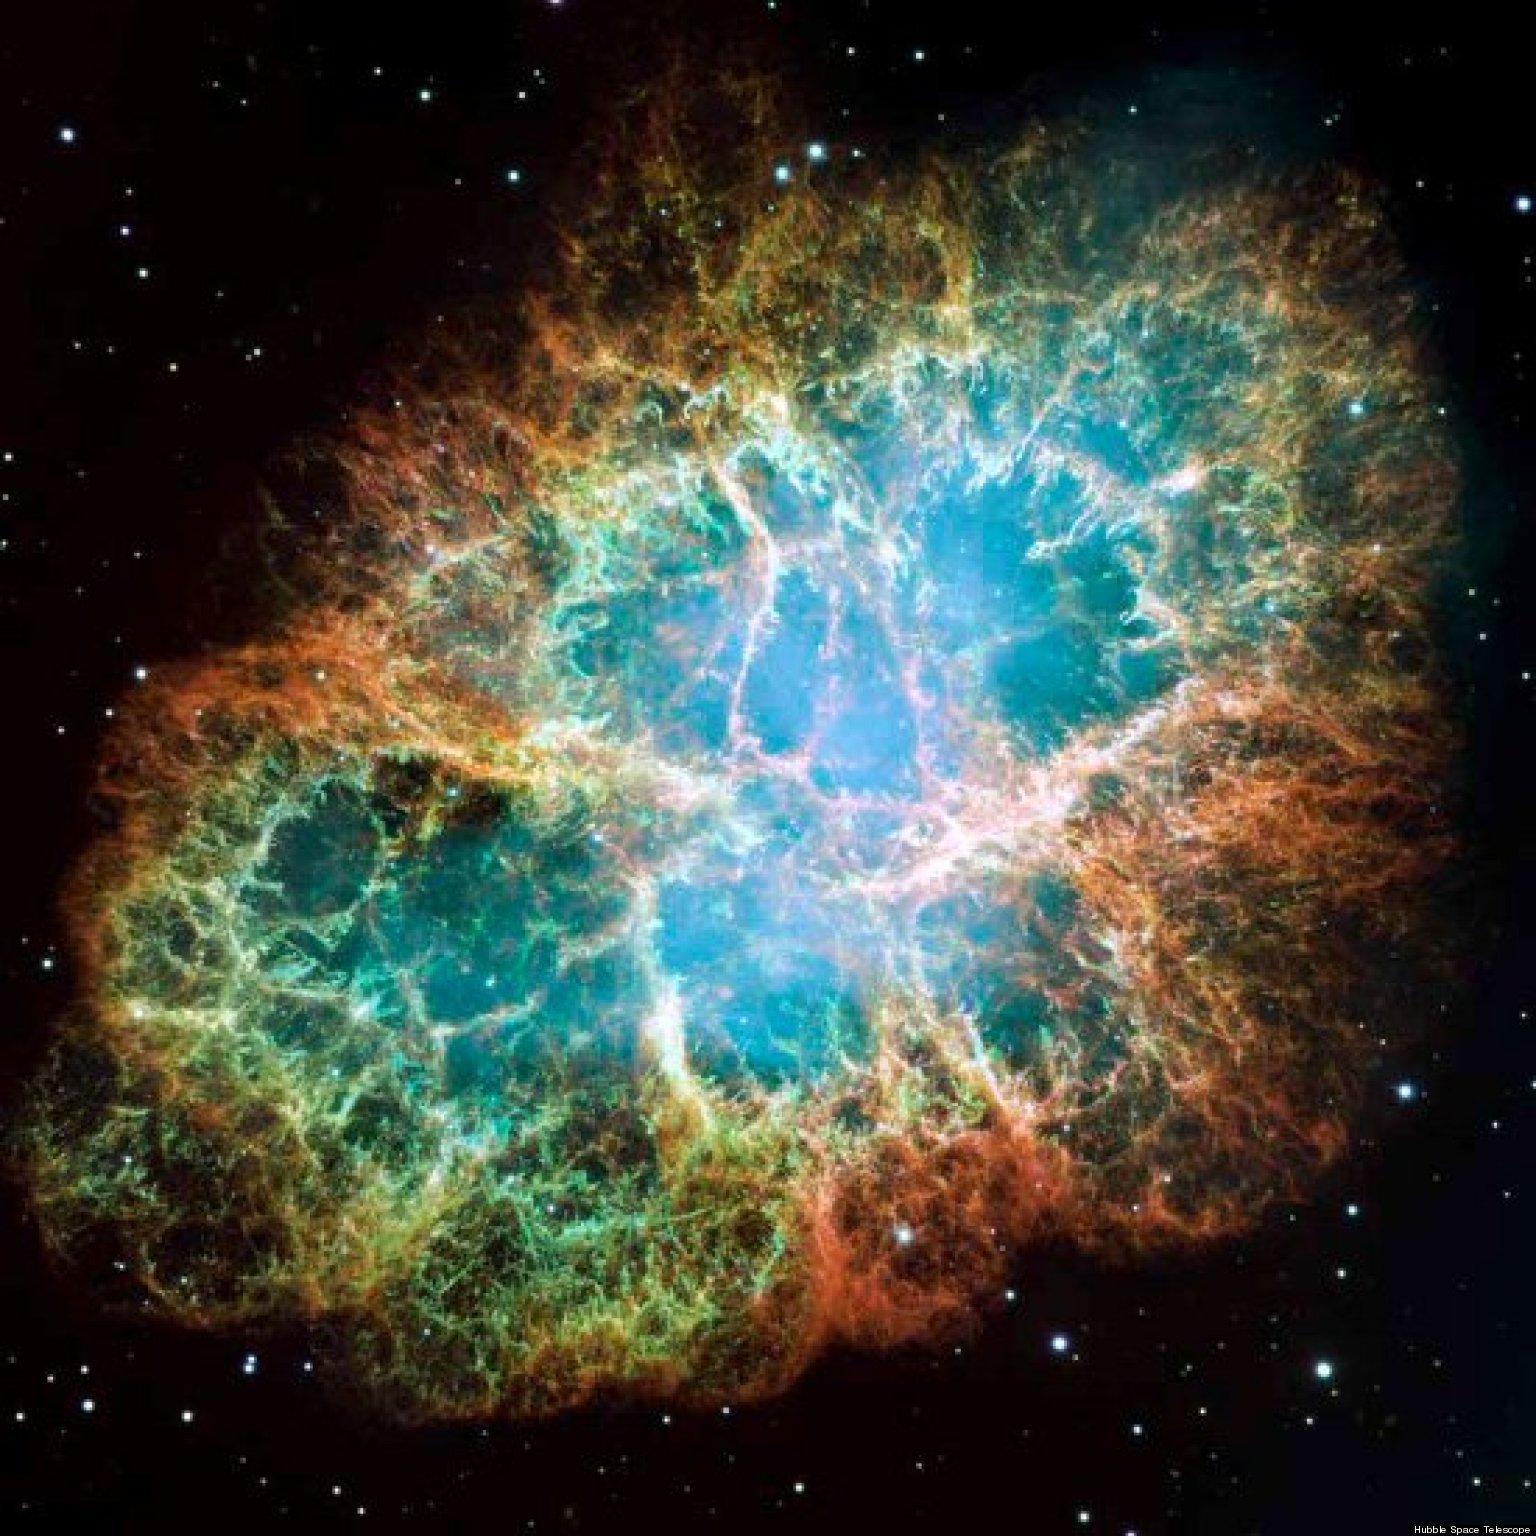 The Hubble Space Telescope S Greatest Art